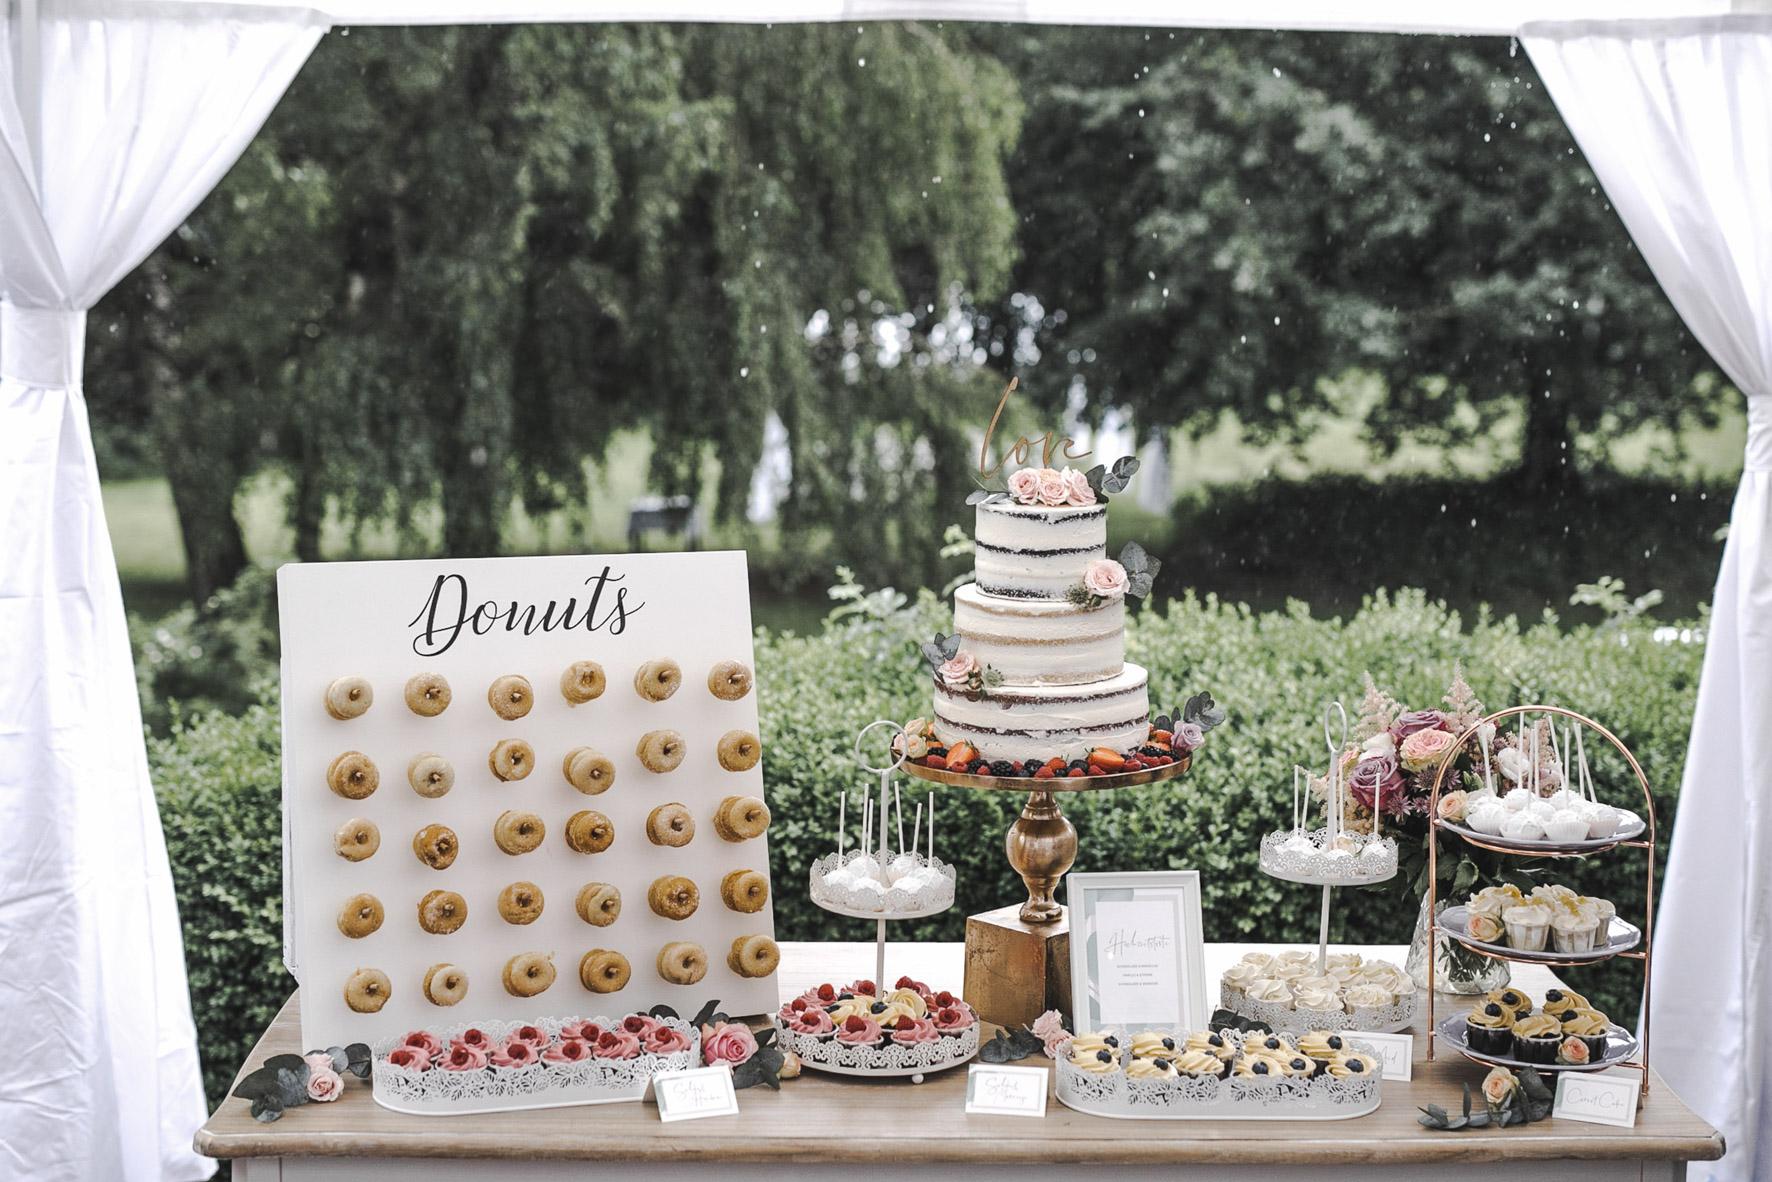 Regen Hochzeit Glanzmomente Sweet Table